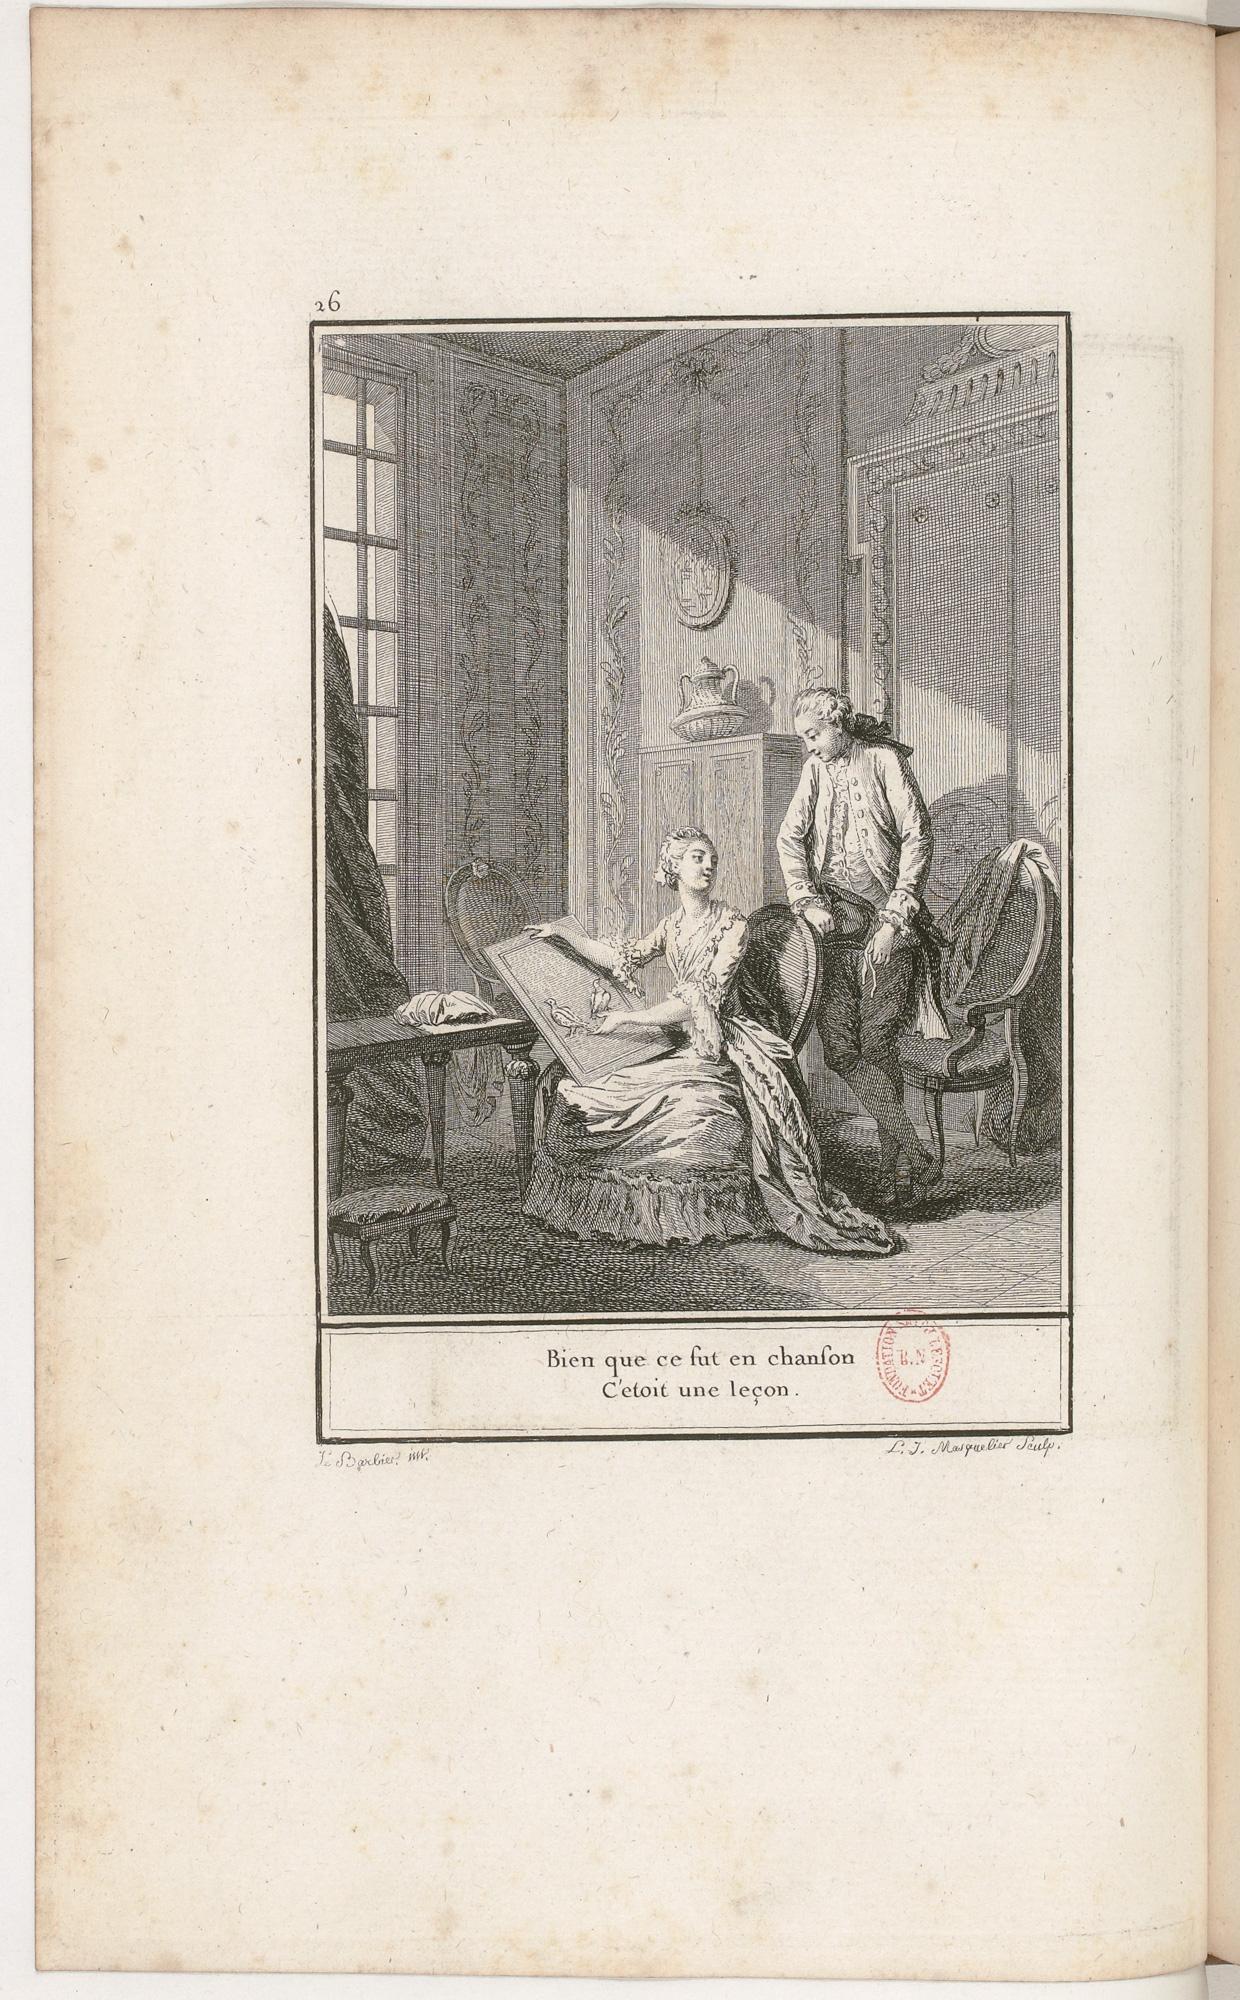 S.3.05 La leçon, 1772, Image